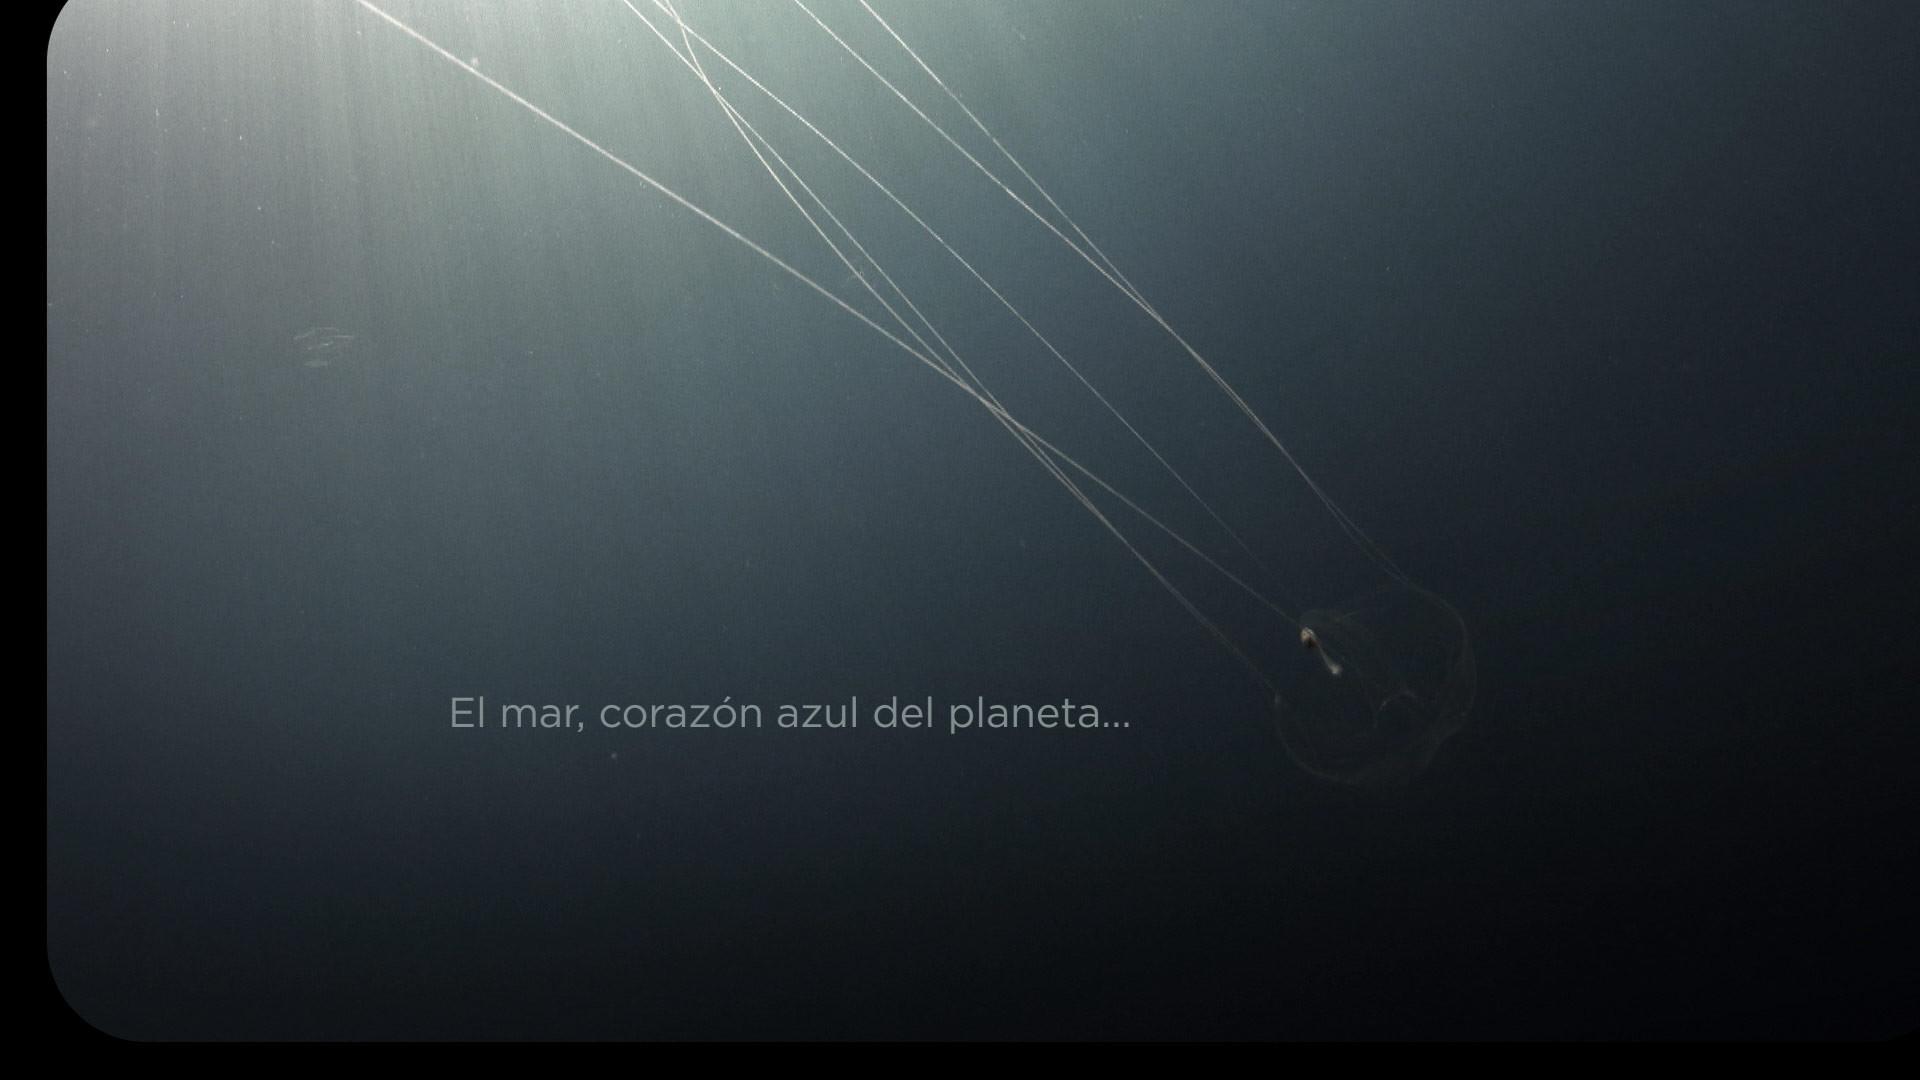 CORTINILLA-EXPEDICION-(0;00;33;09).jpg